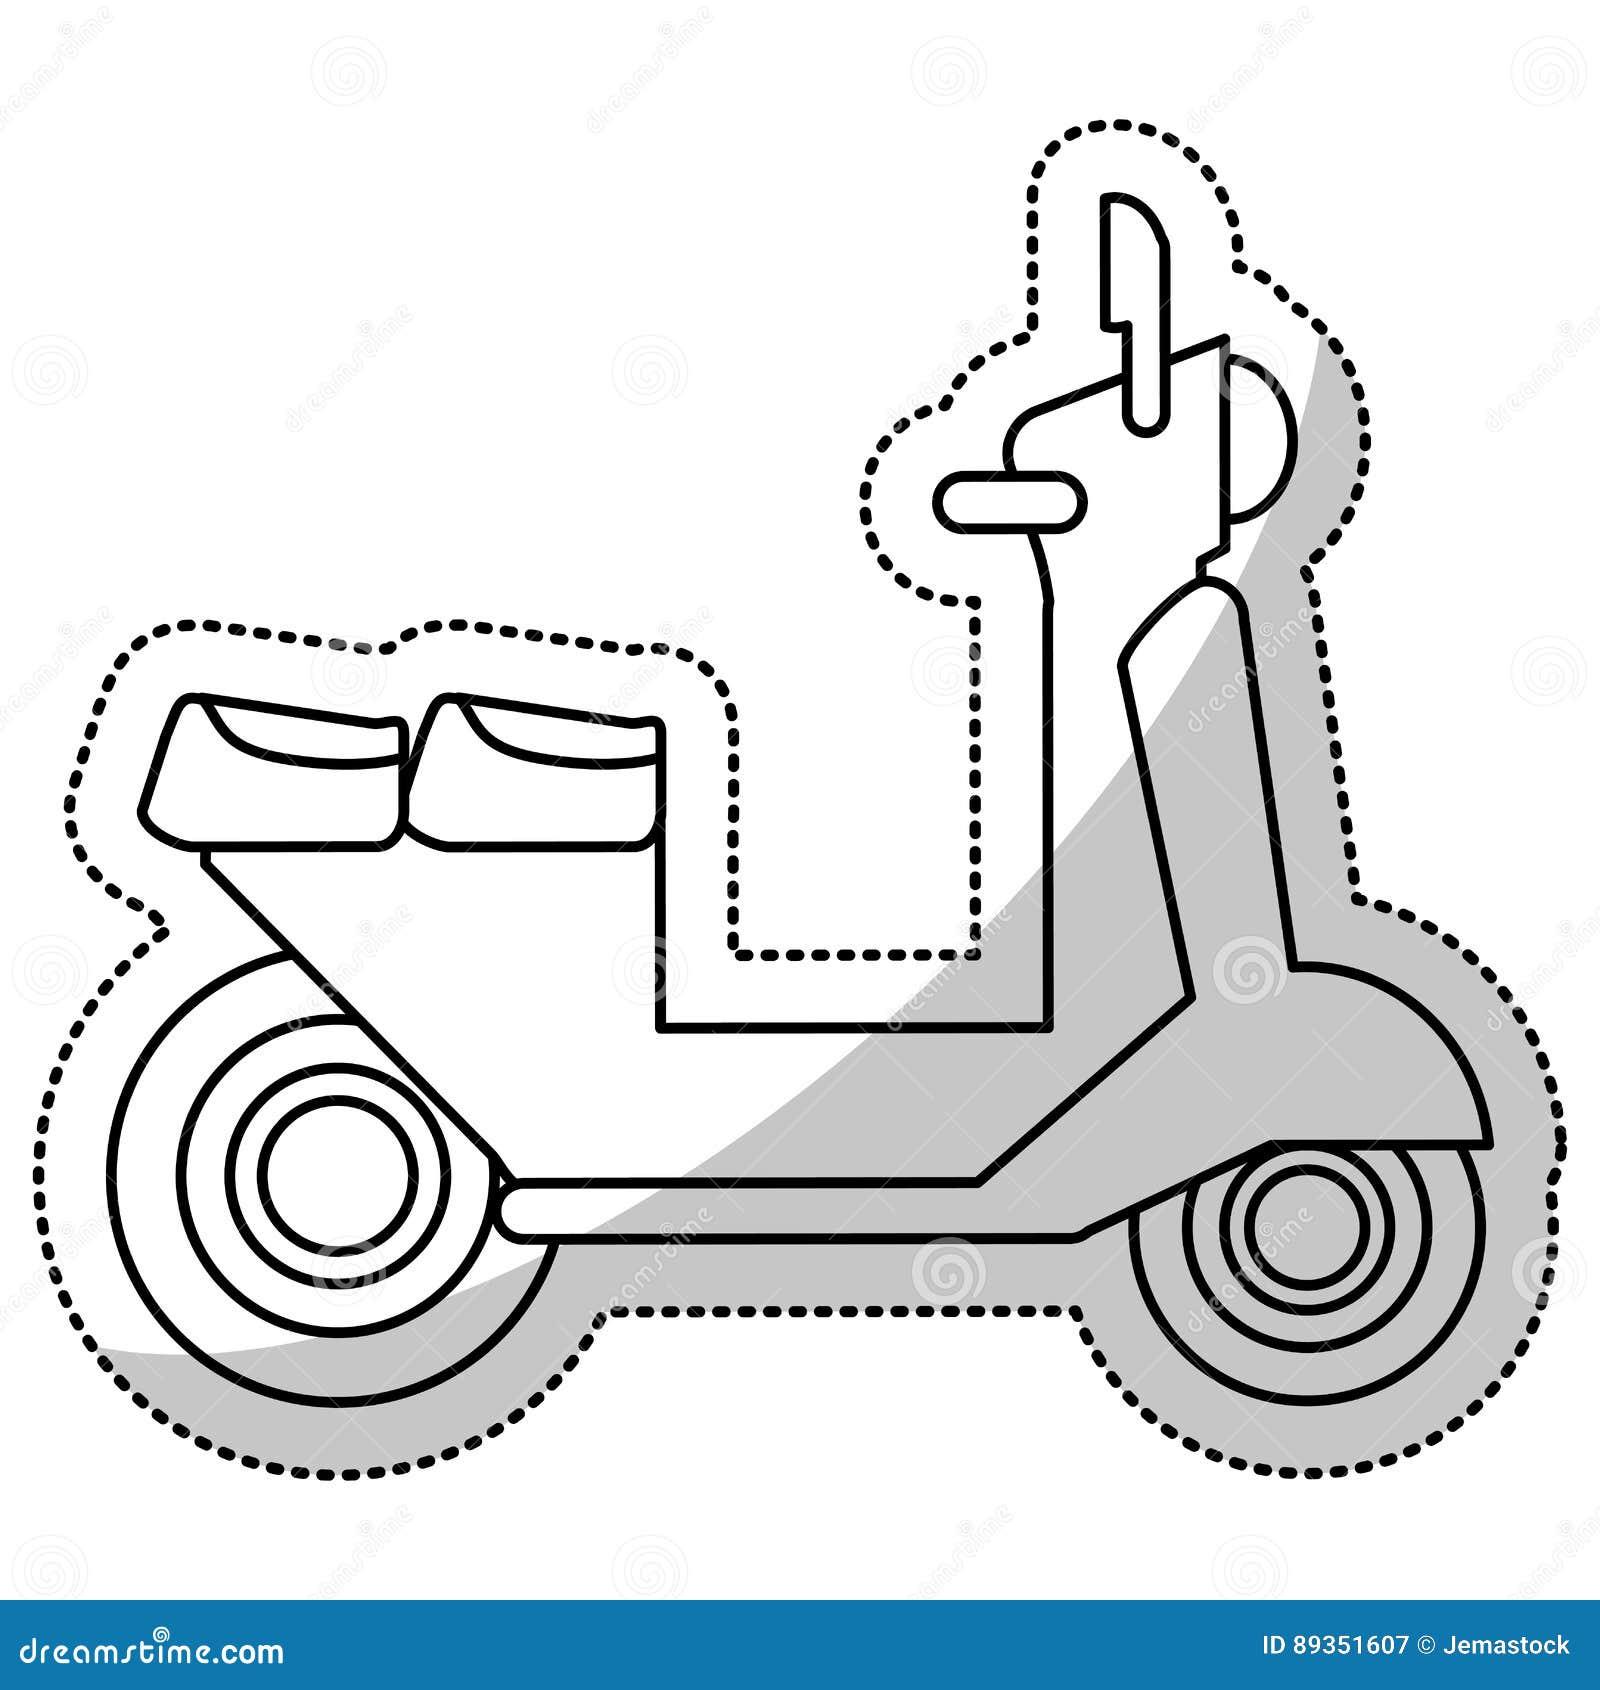 vespa car wiring diagram database Verucci Wiring Diagram vespa scooter transport delivery cut line stock illustration blown vespa car vespa car